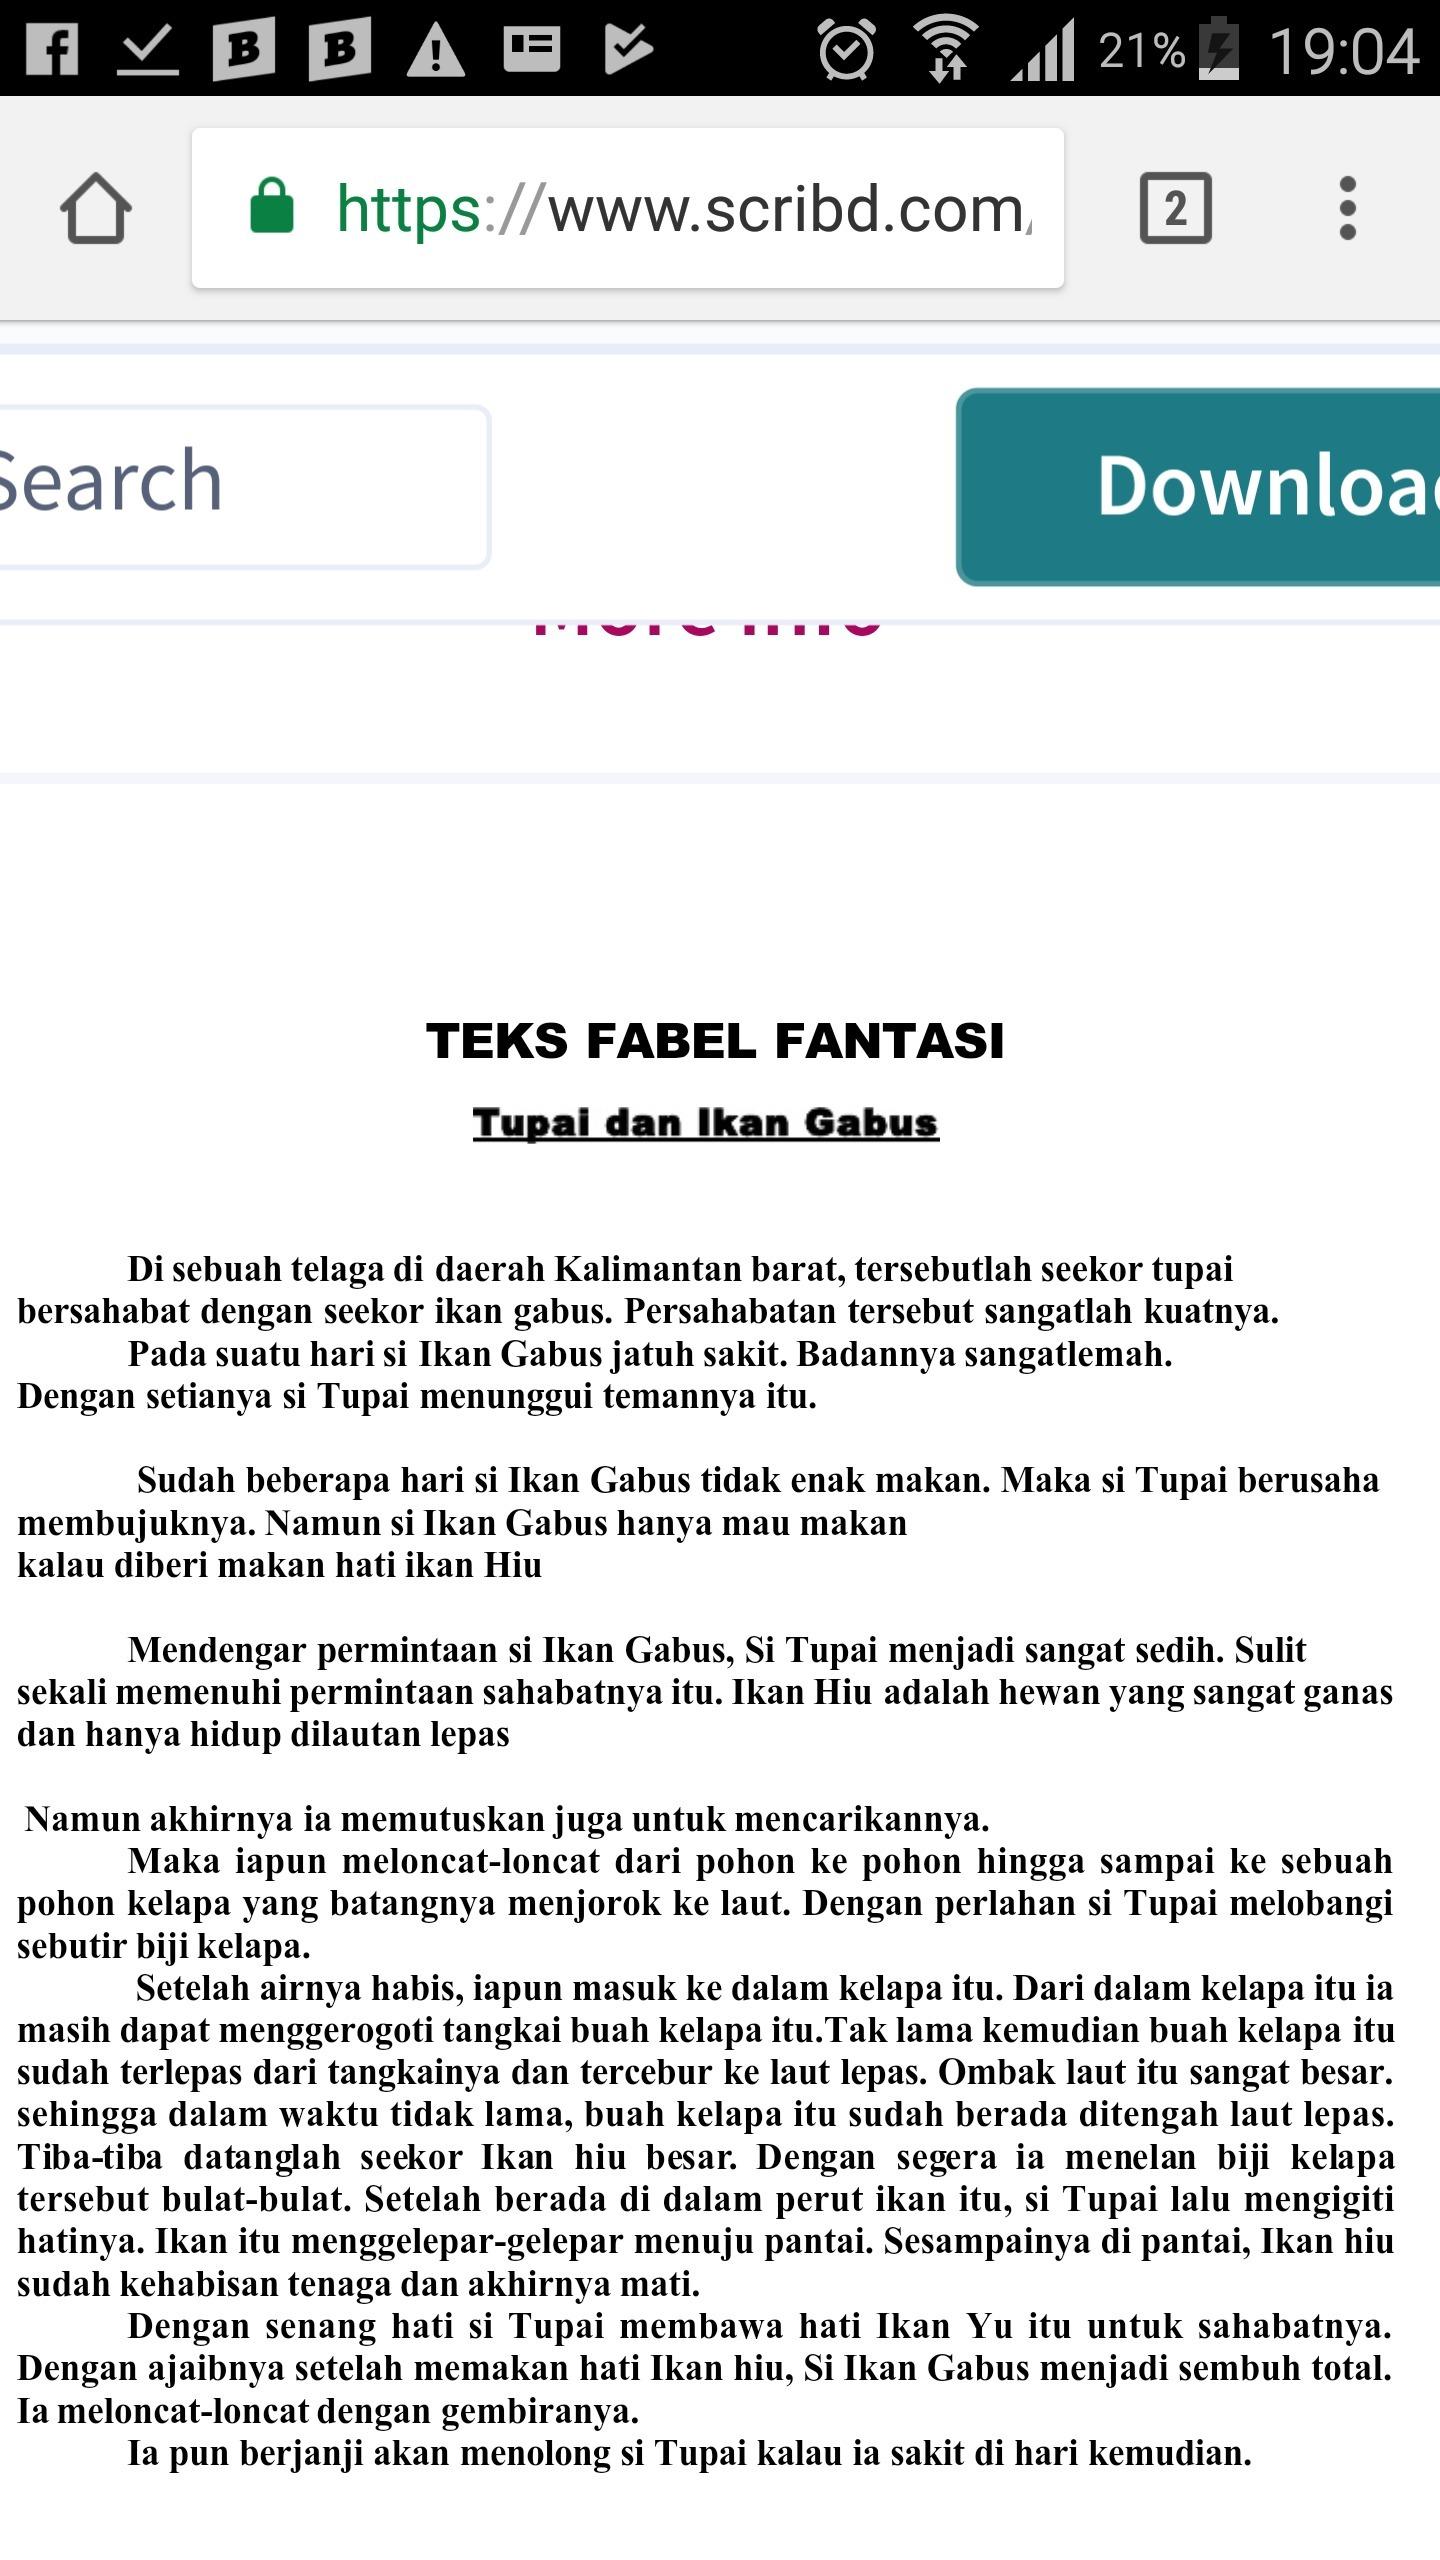 Unsur Intrinsik Fabel : unsur, intrinsik, fabel, Tentukan, Unsur, Intrensik, Fabel, Berikut!A.Tokoh, Karakter, Disertai, Bukti, TeksB.Latar, Tempat, Brainly.co.id